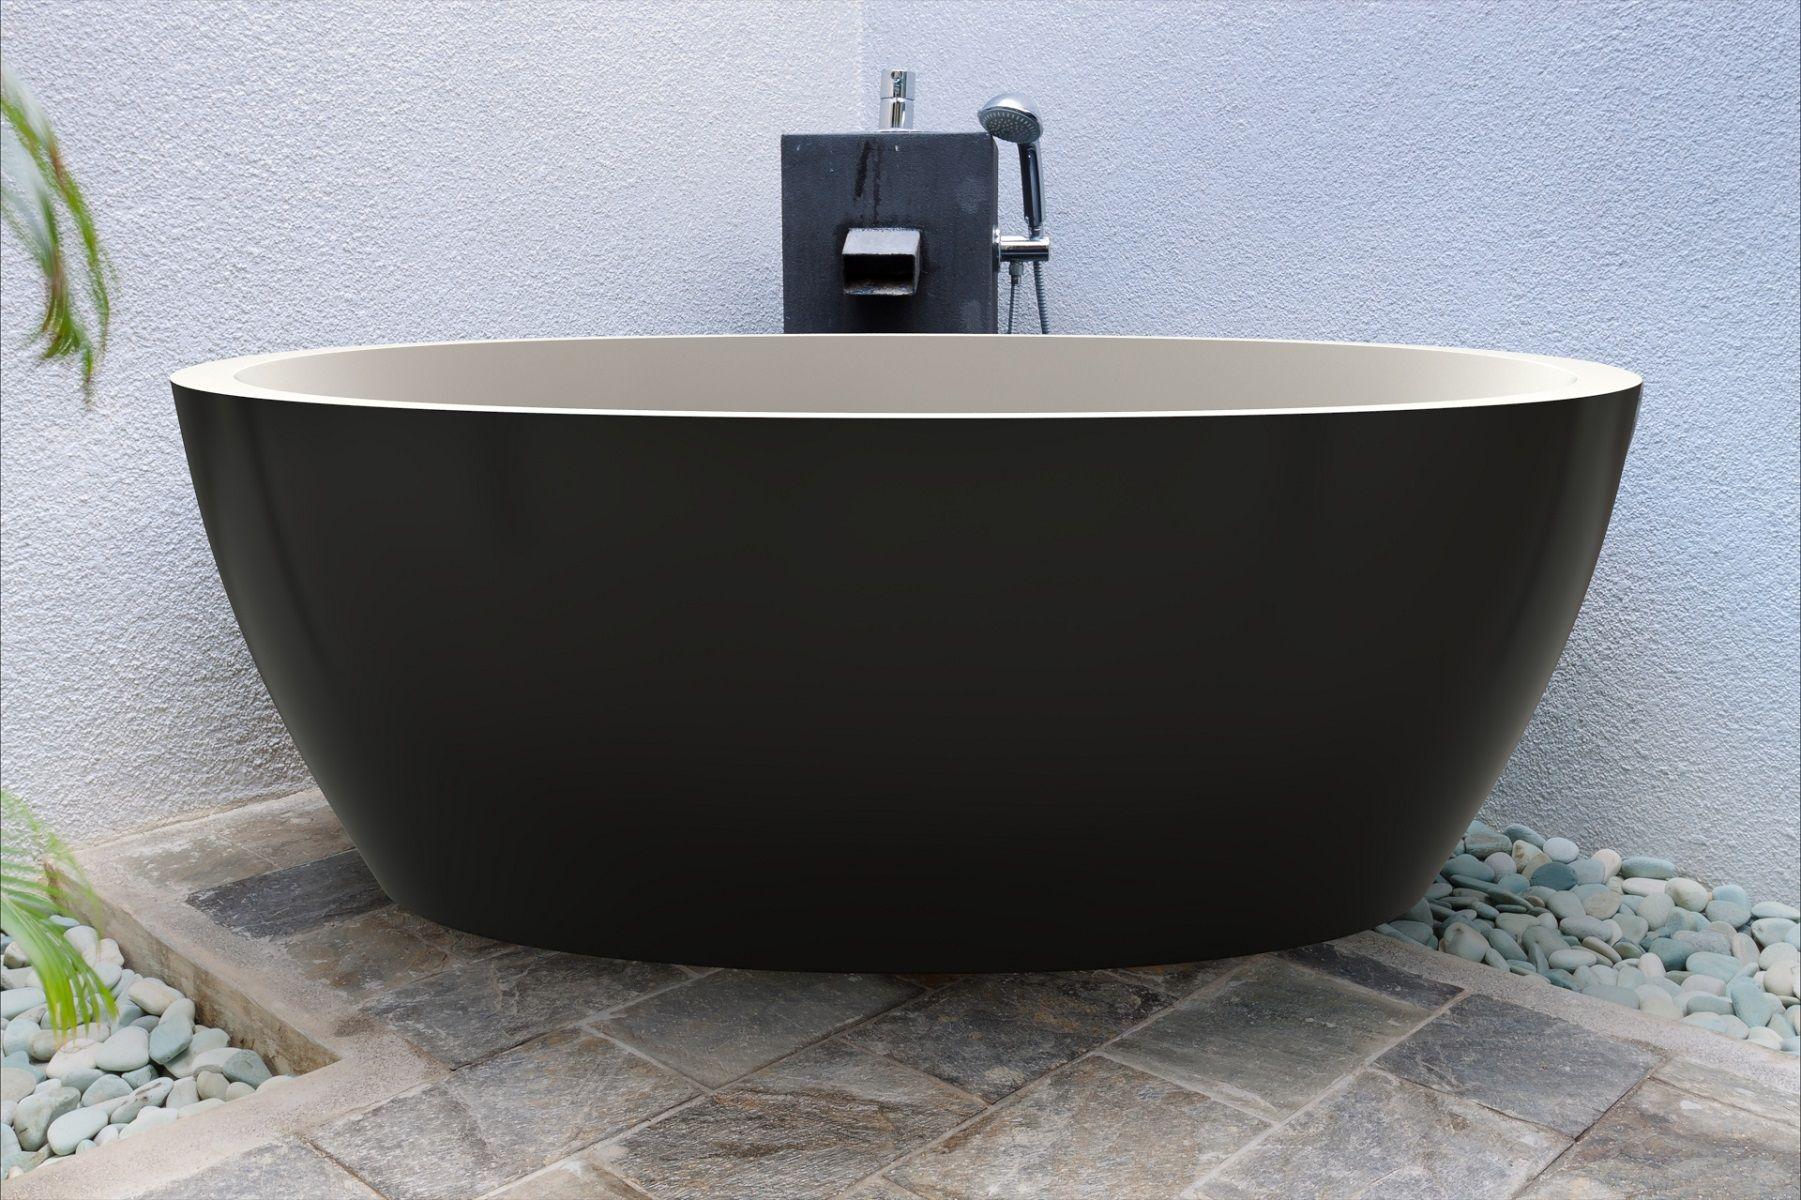 Aquatica Sensuality Blck Wht Freestanding Solid Surface Bathtub